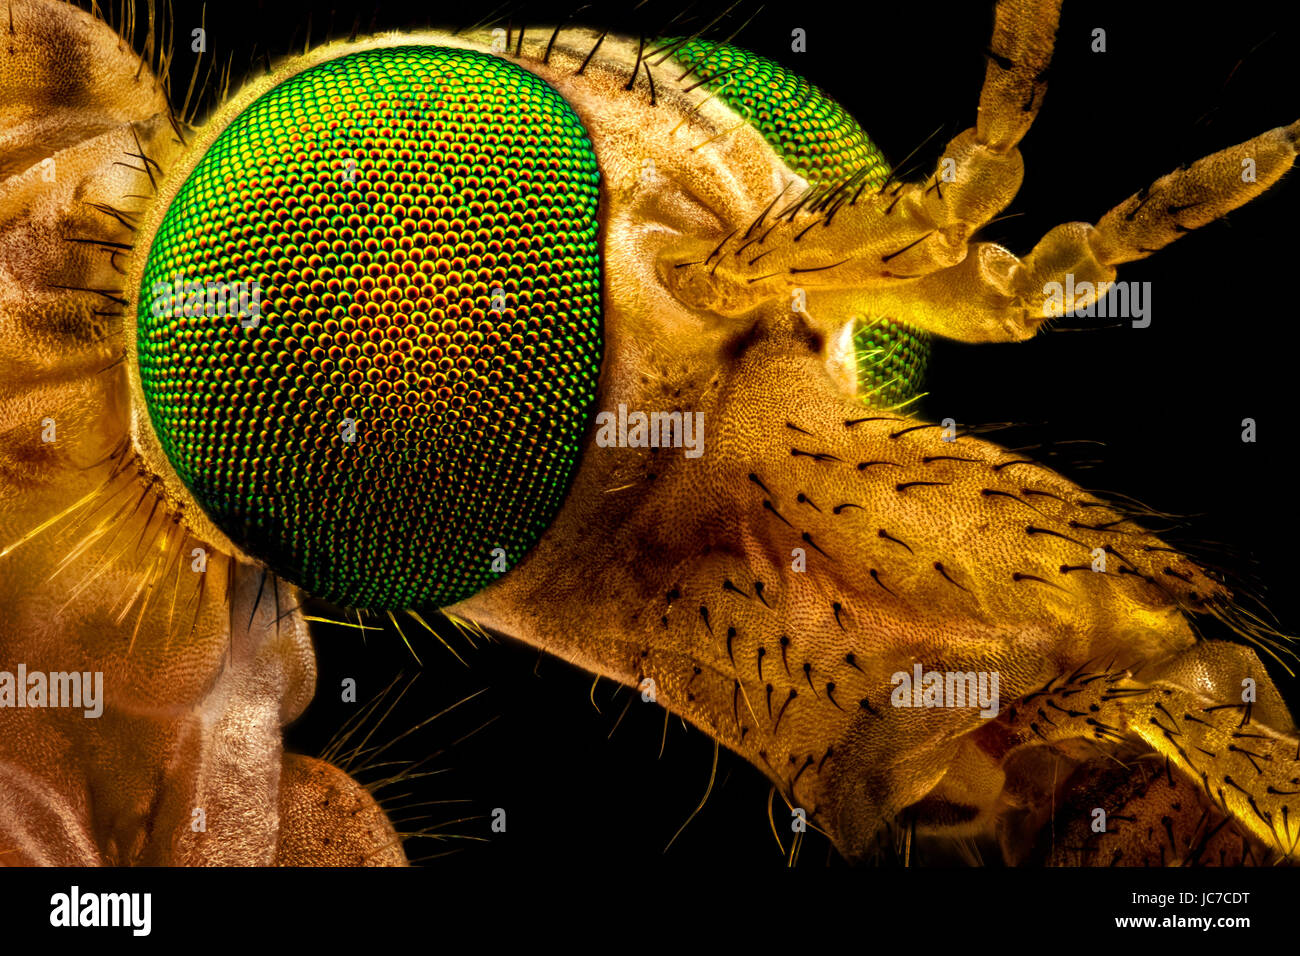 Macro extrema - retrato de un verde eyed fly crane, amplificado a través de un microscopio objetivo (anchura Imagen De Stock